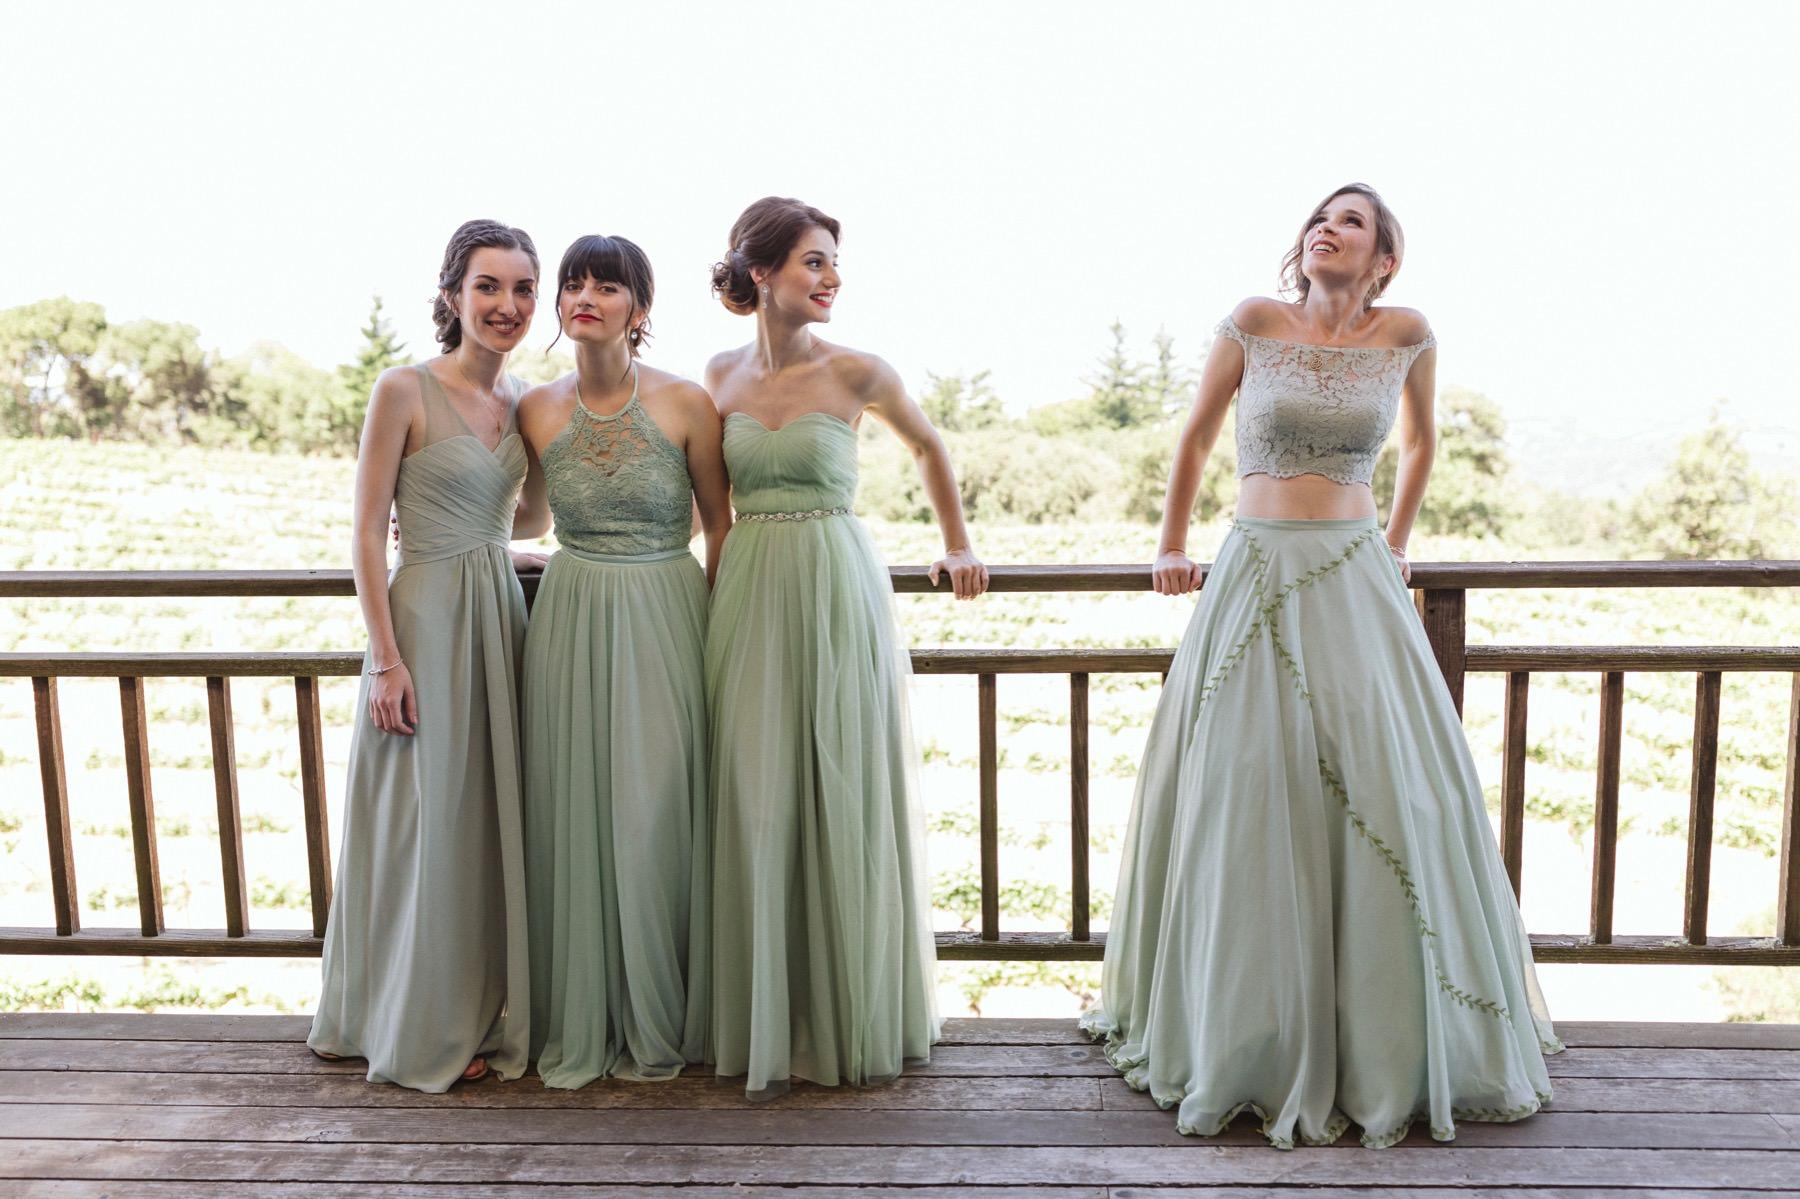 Fogarty wedding photographer